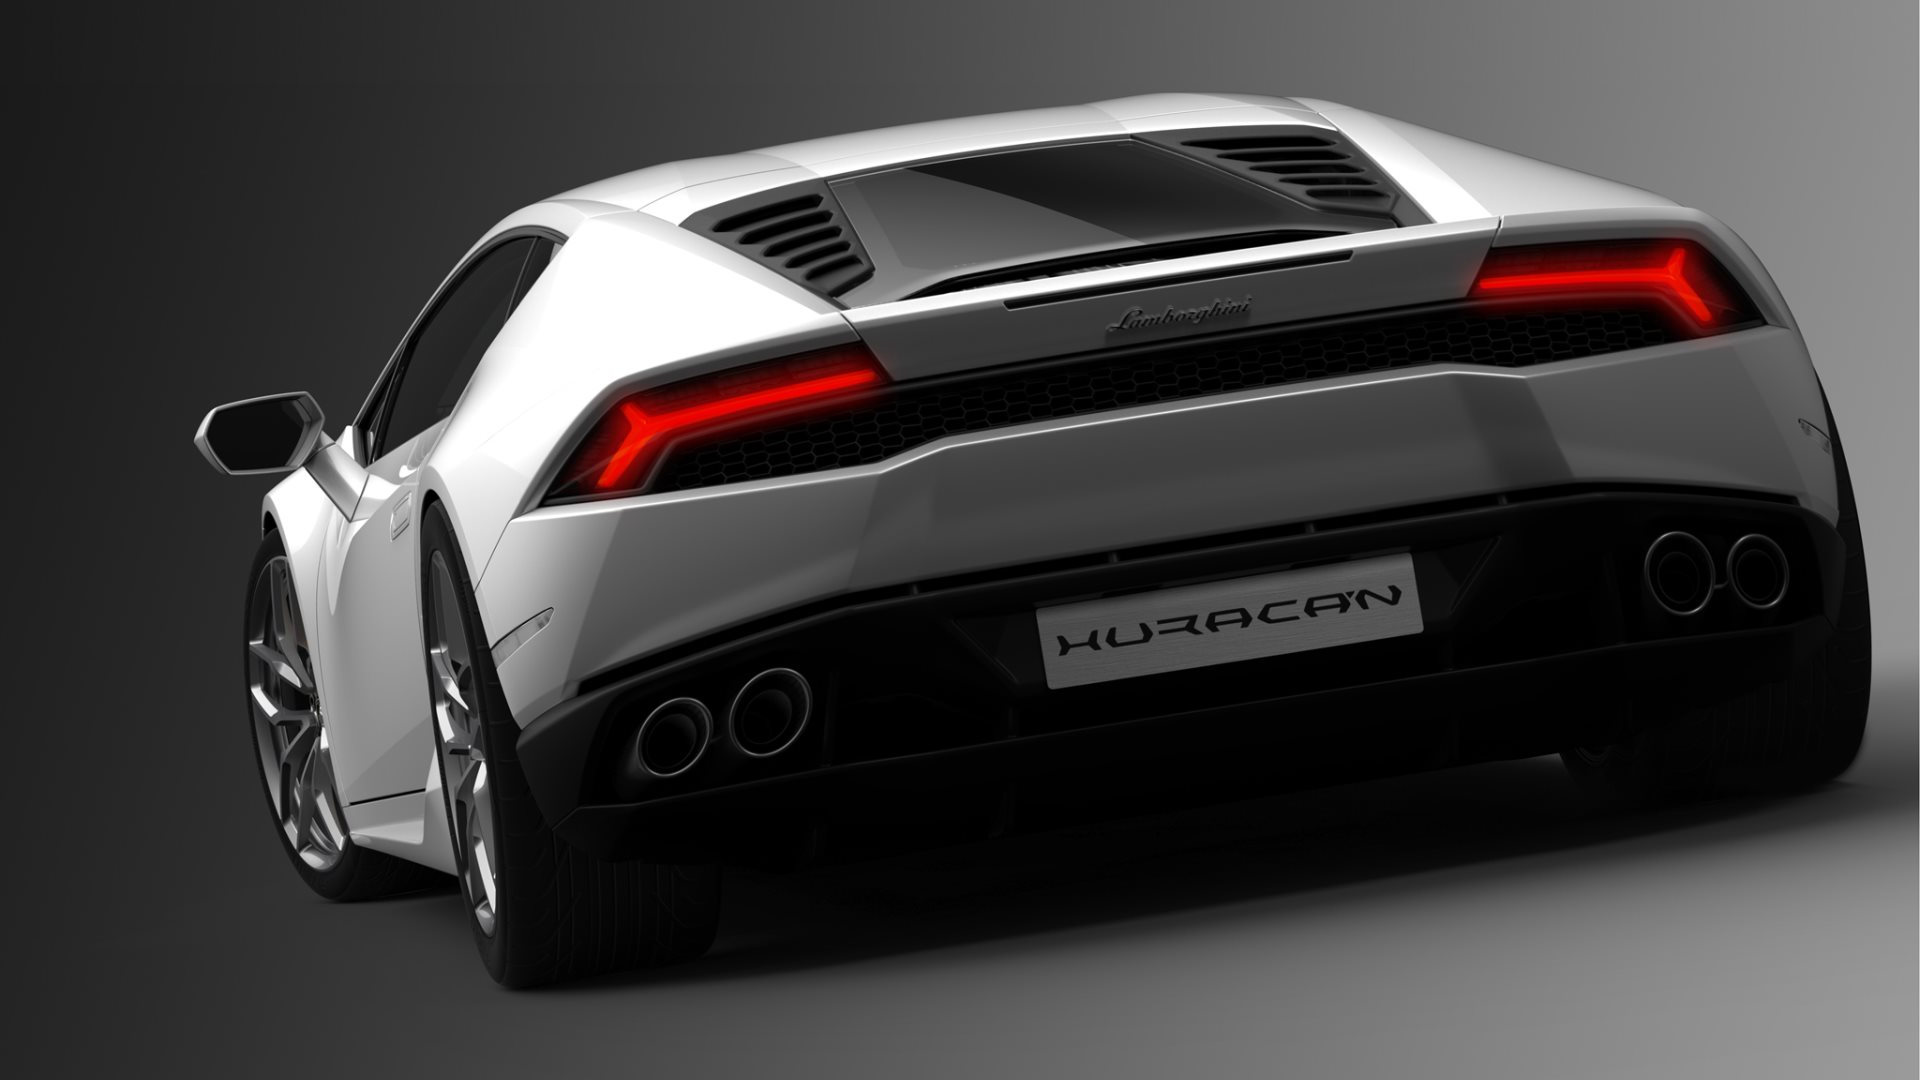 wallpaper 3 lamborghini huracan high definition hd 1920x1080 - Lamborghini Huracan Hd Wallpaper